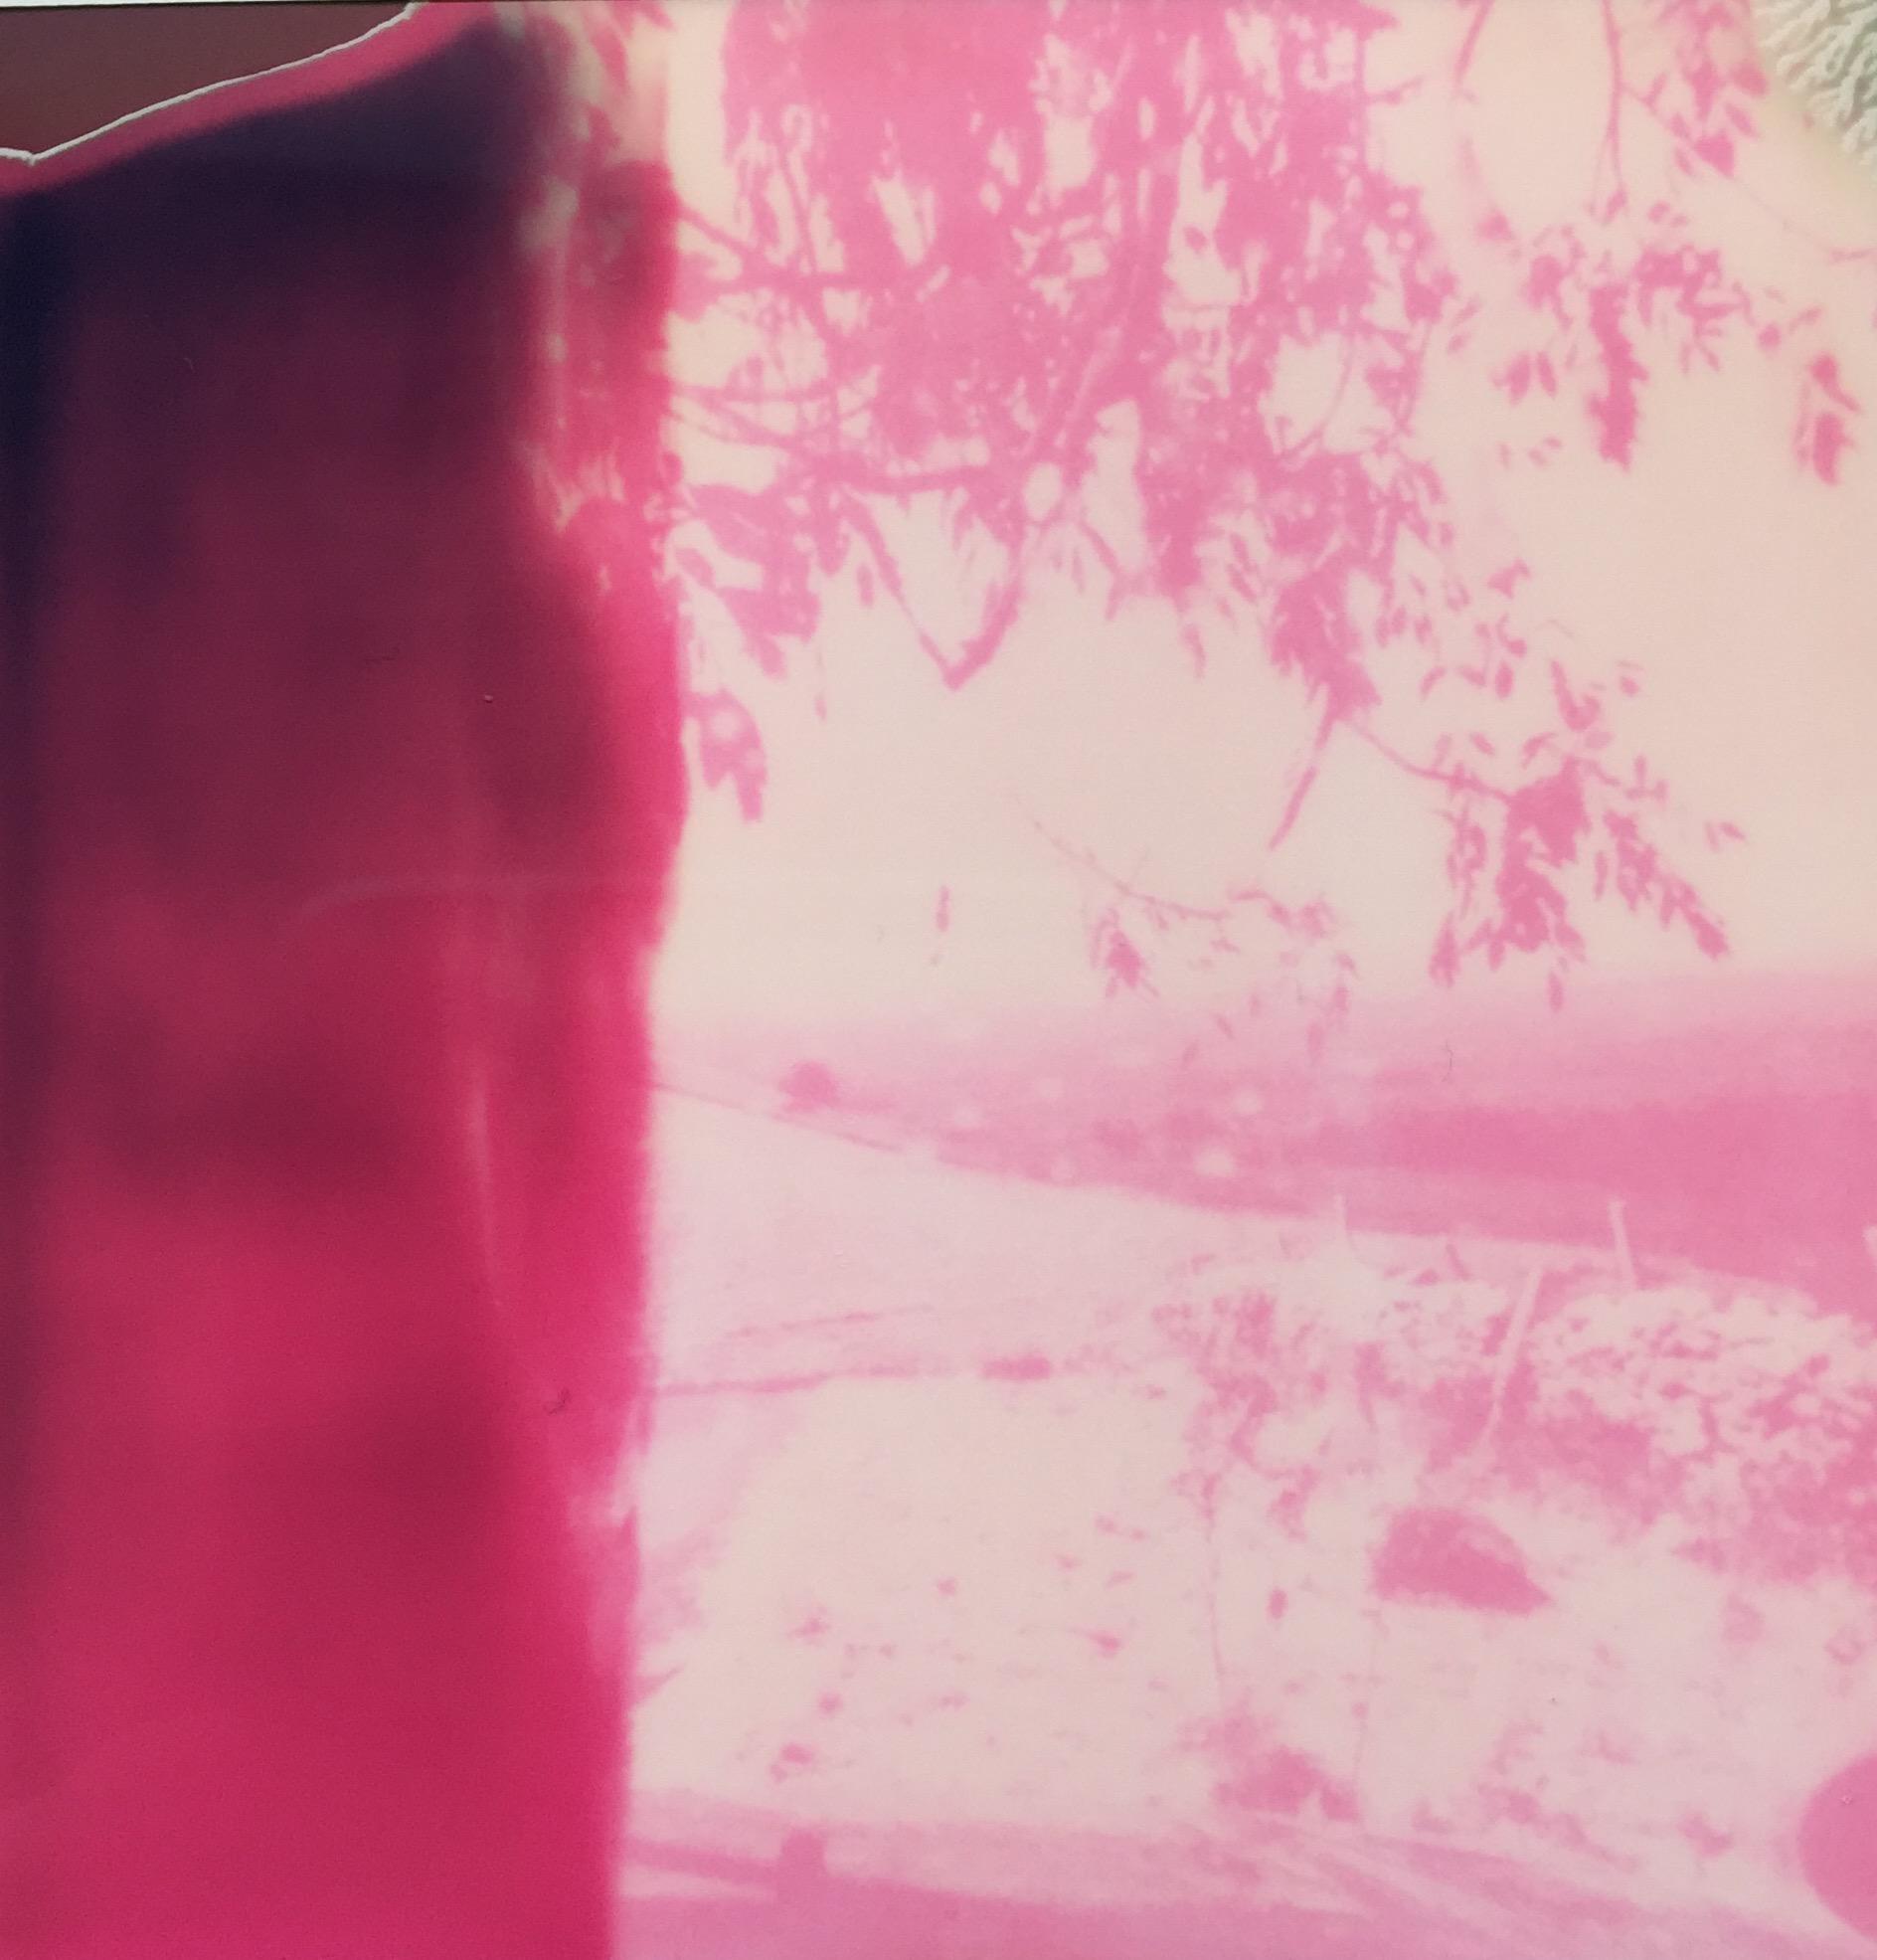 Untitled | Polaroid SX70 | Impossible Project Magenta (Expired) | Rachel Travers | @skarya_1984